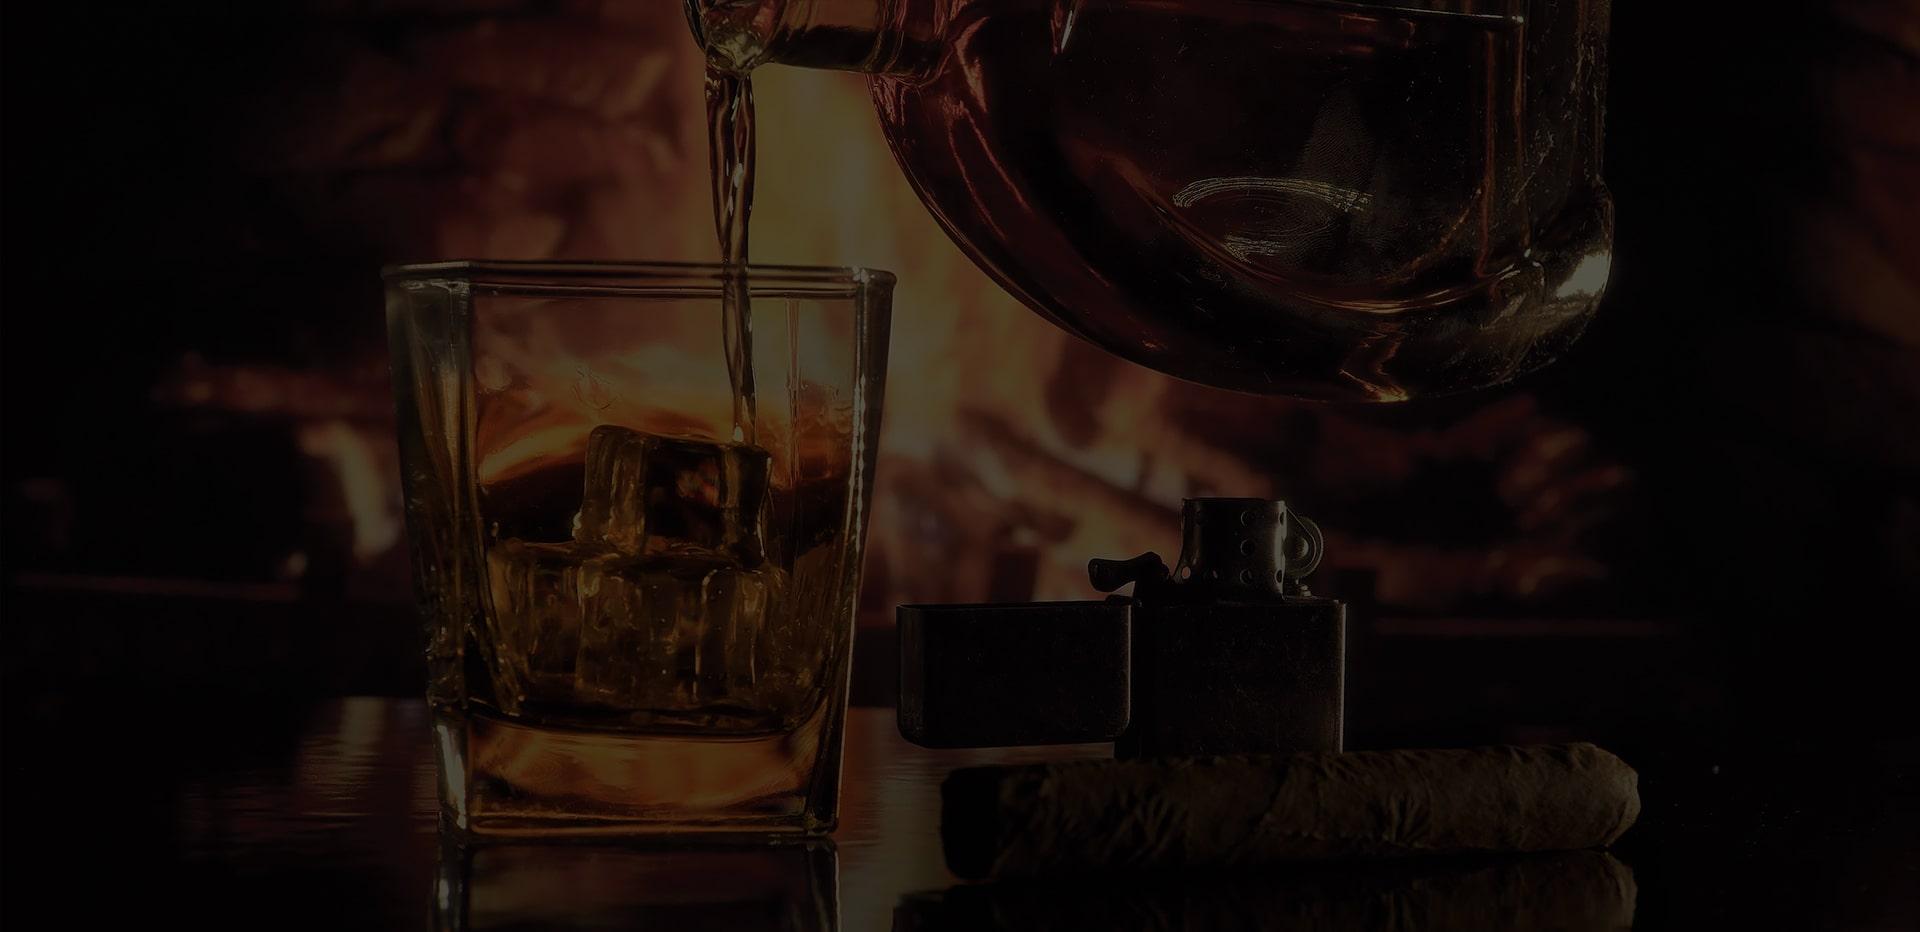 Background image slider Whisky Bastille Single Malt